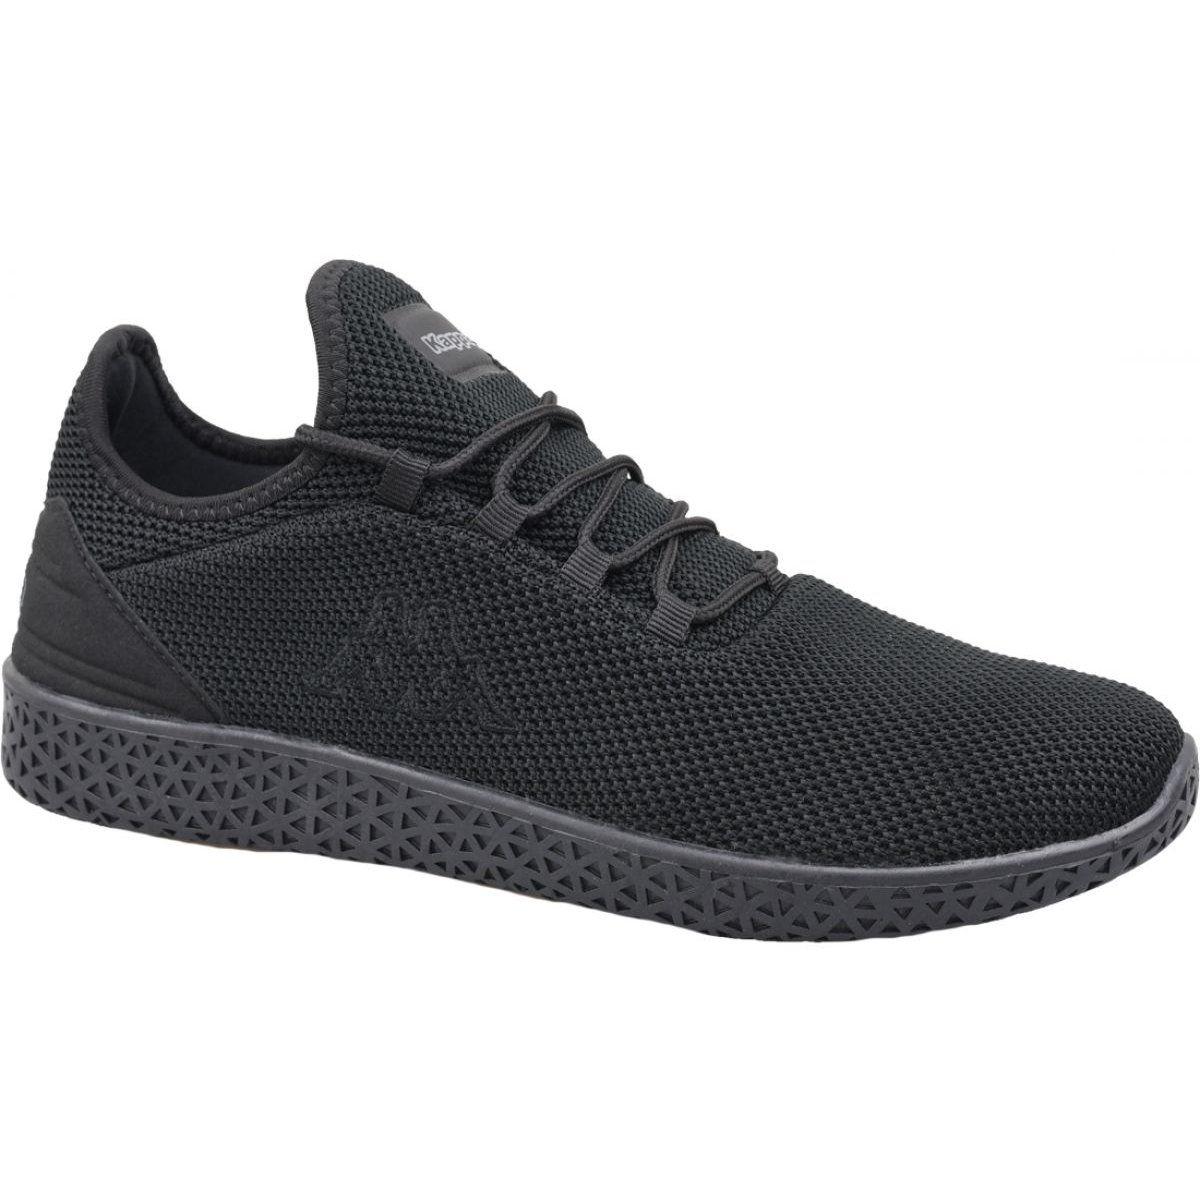 Buty Kappa Icon Knt Oc M 242716 1111 Czarne All Black Sneakers Black Shoes Mens